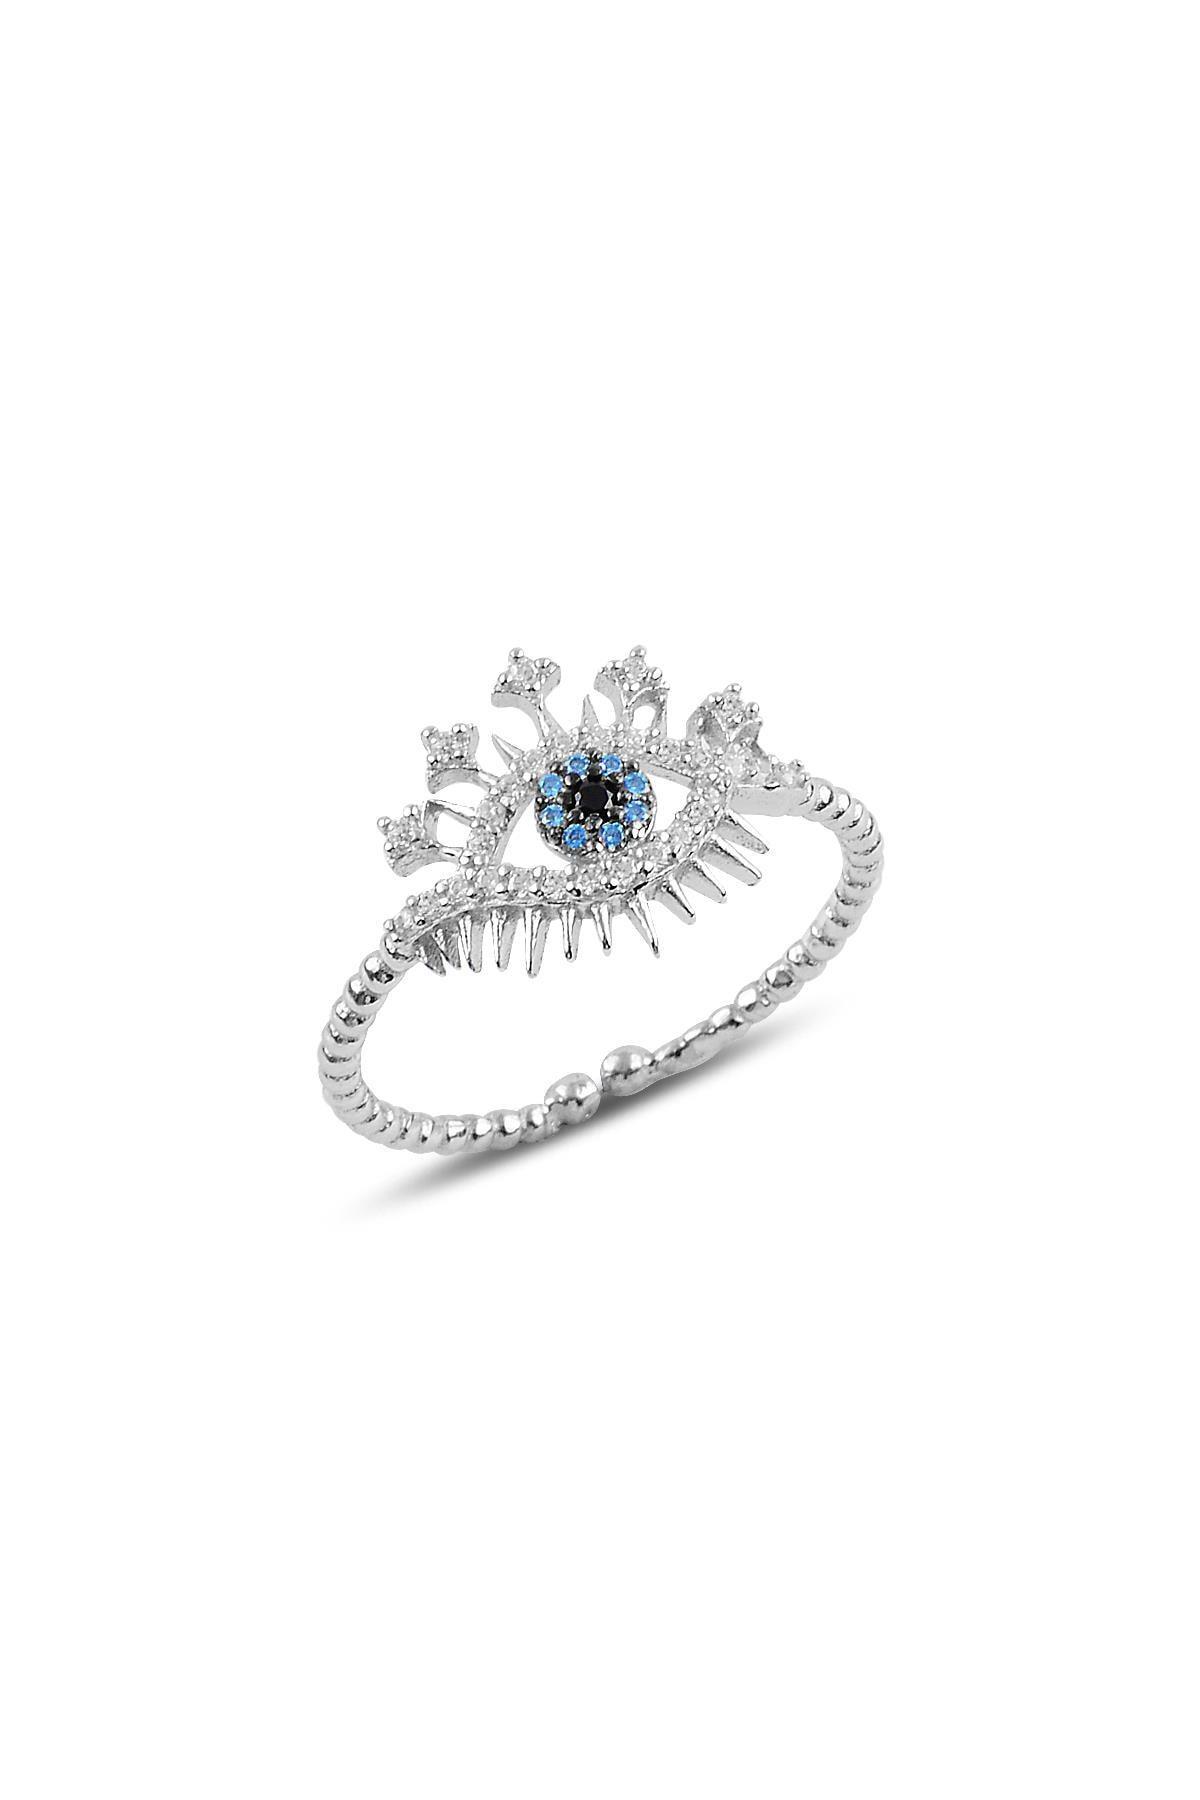 Söğütlü Silver Gümüş rodyumlu zirkon taşlı lareyn kolye küpe ve yüzük gümüş set 2